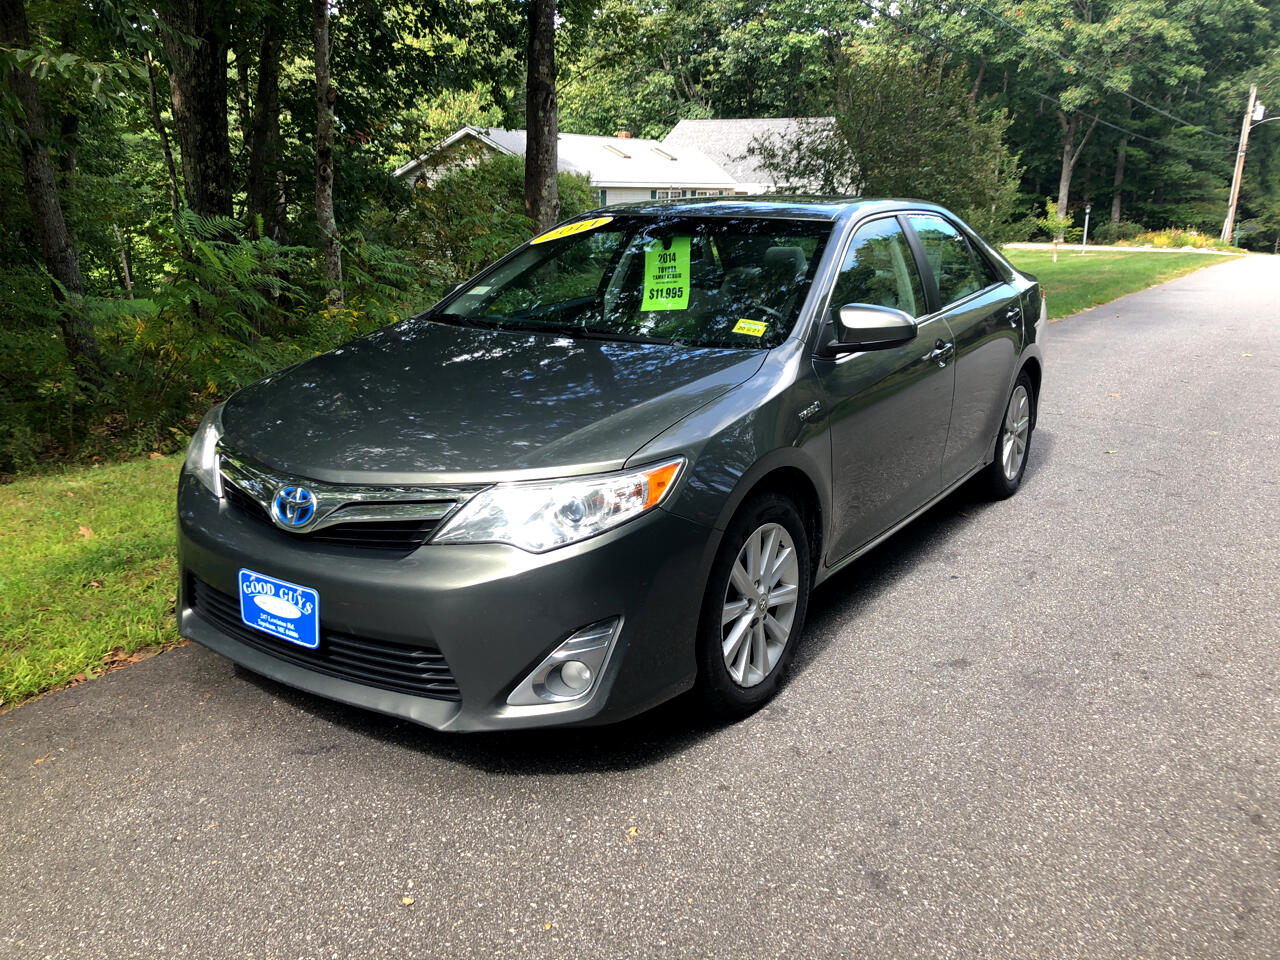 Toyota Camry Hybrid 2014.5 4dr Sdn XLE (Natl) 2014